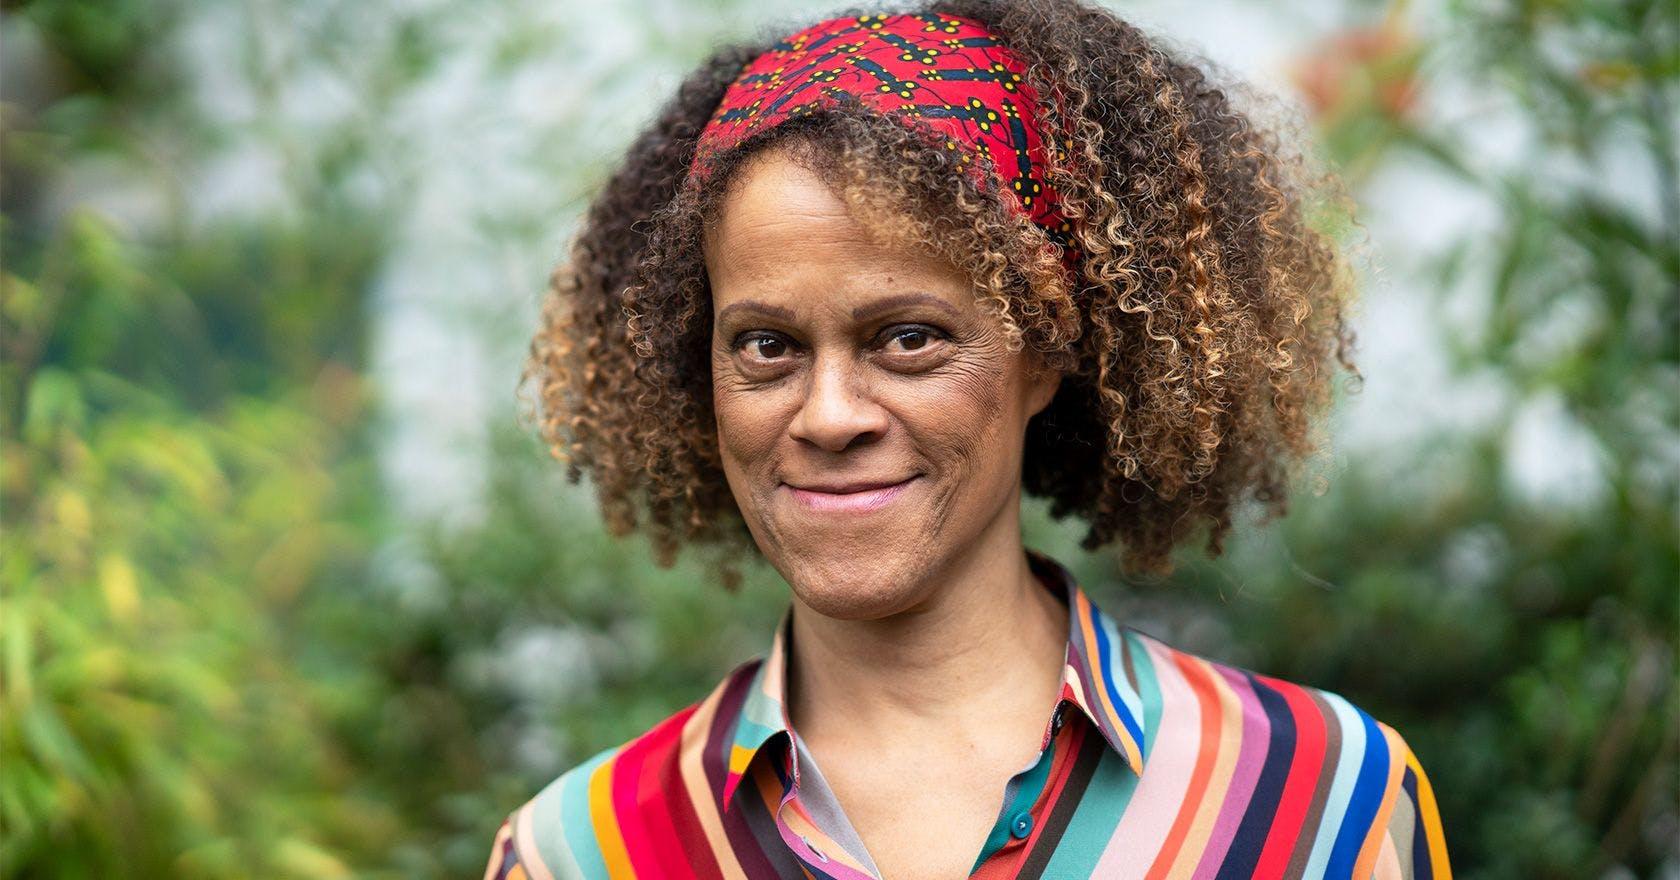 5 things we learned about Bernardine Evaristo on her Desert Island Discs episode